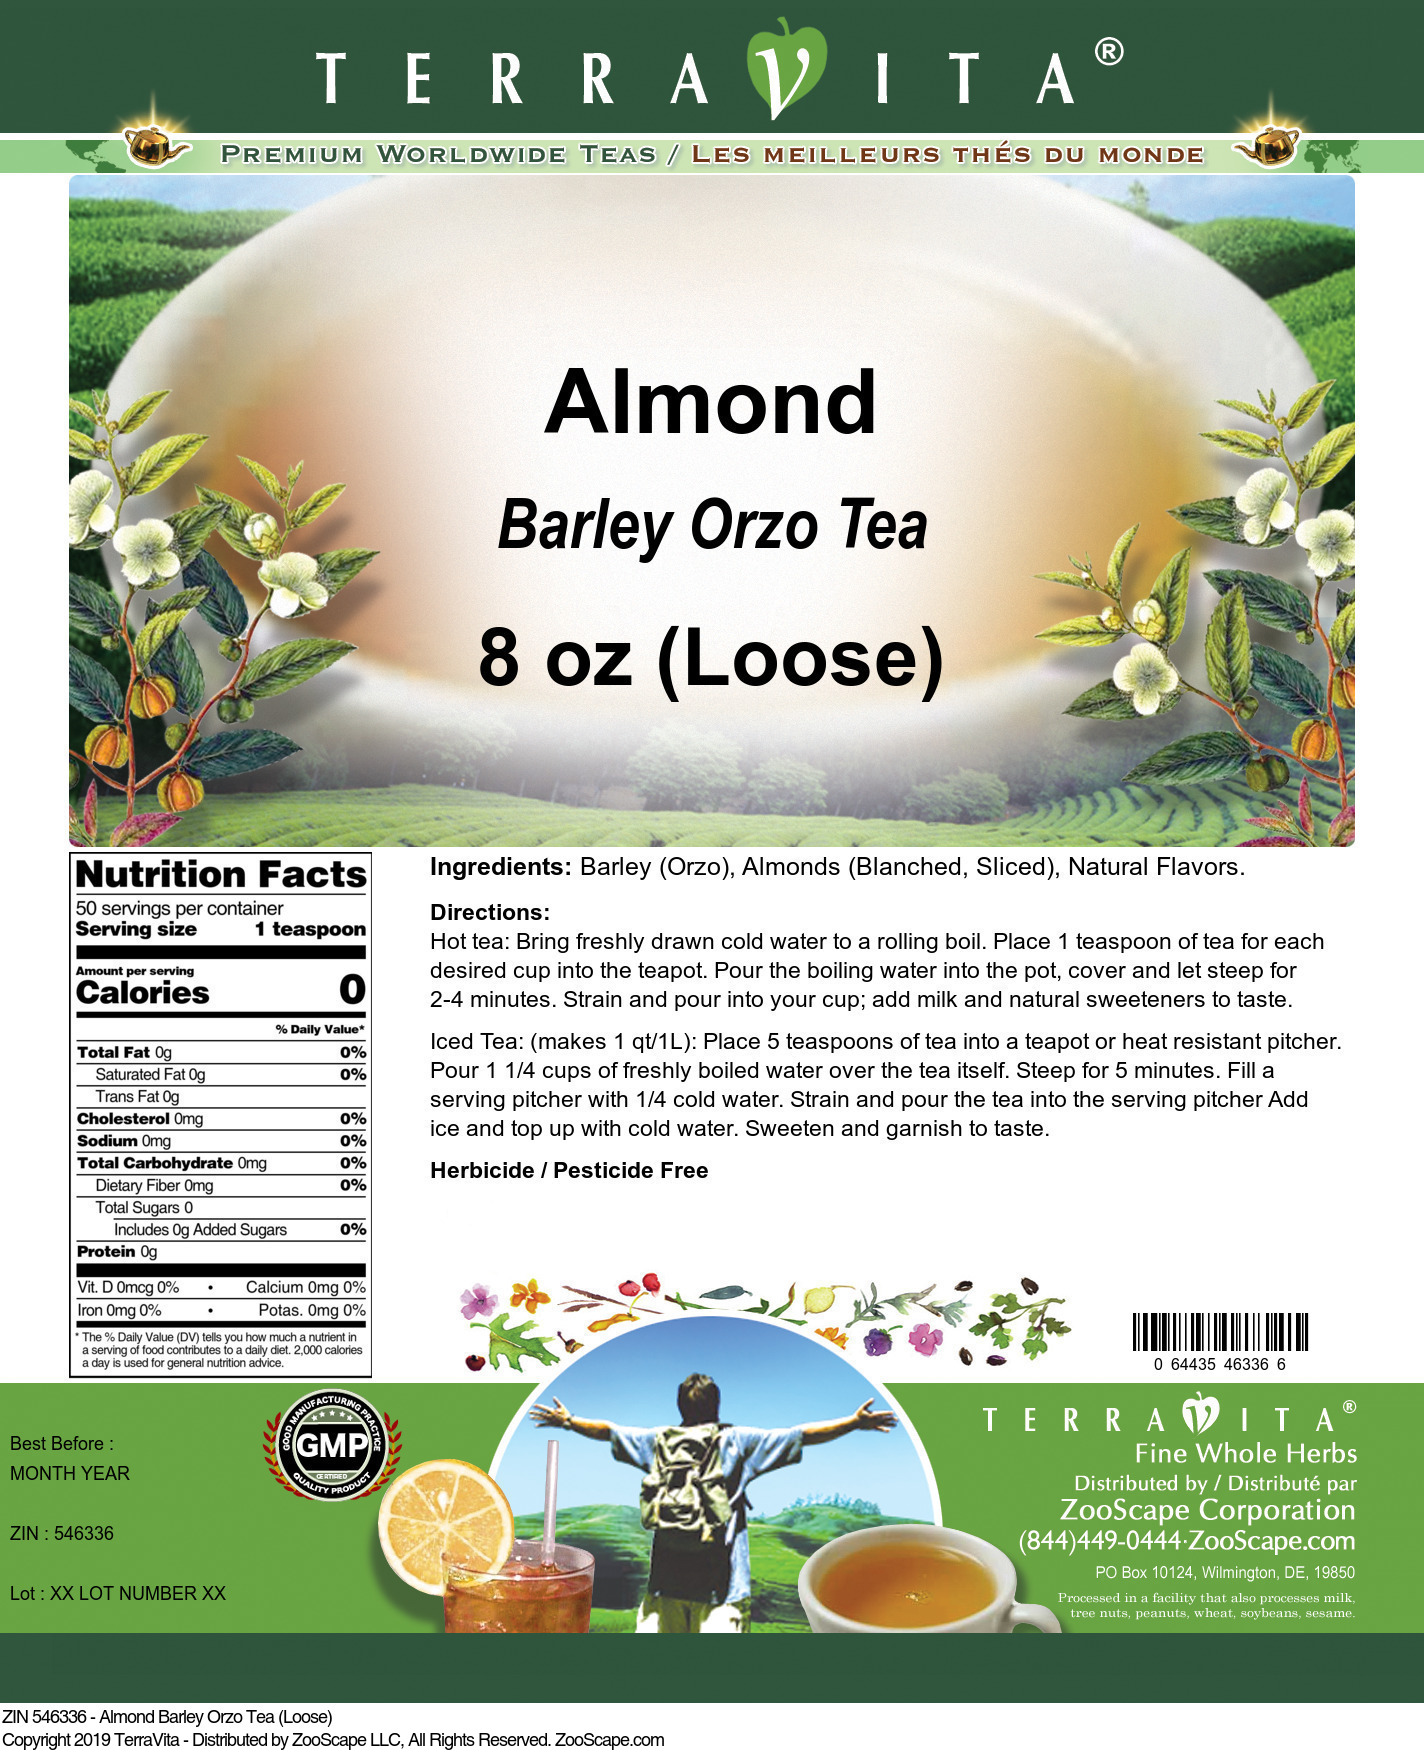 Almond Barley Orzo Tea (Loose)